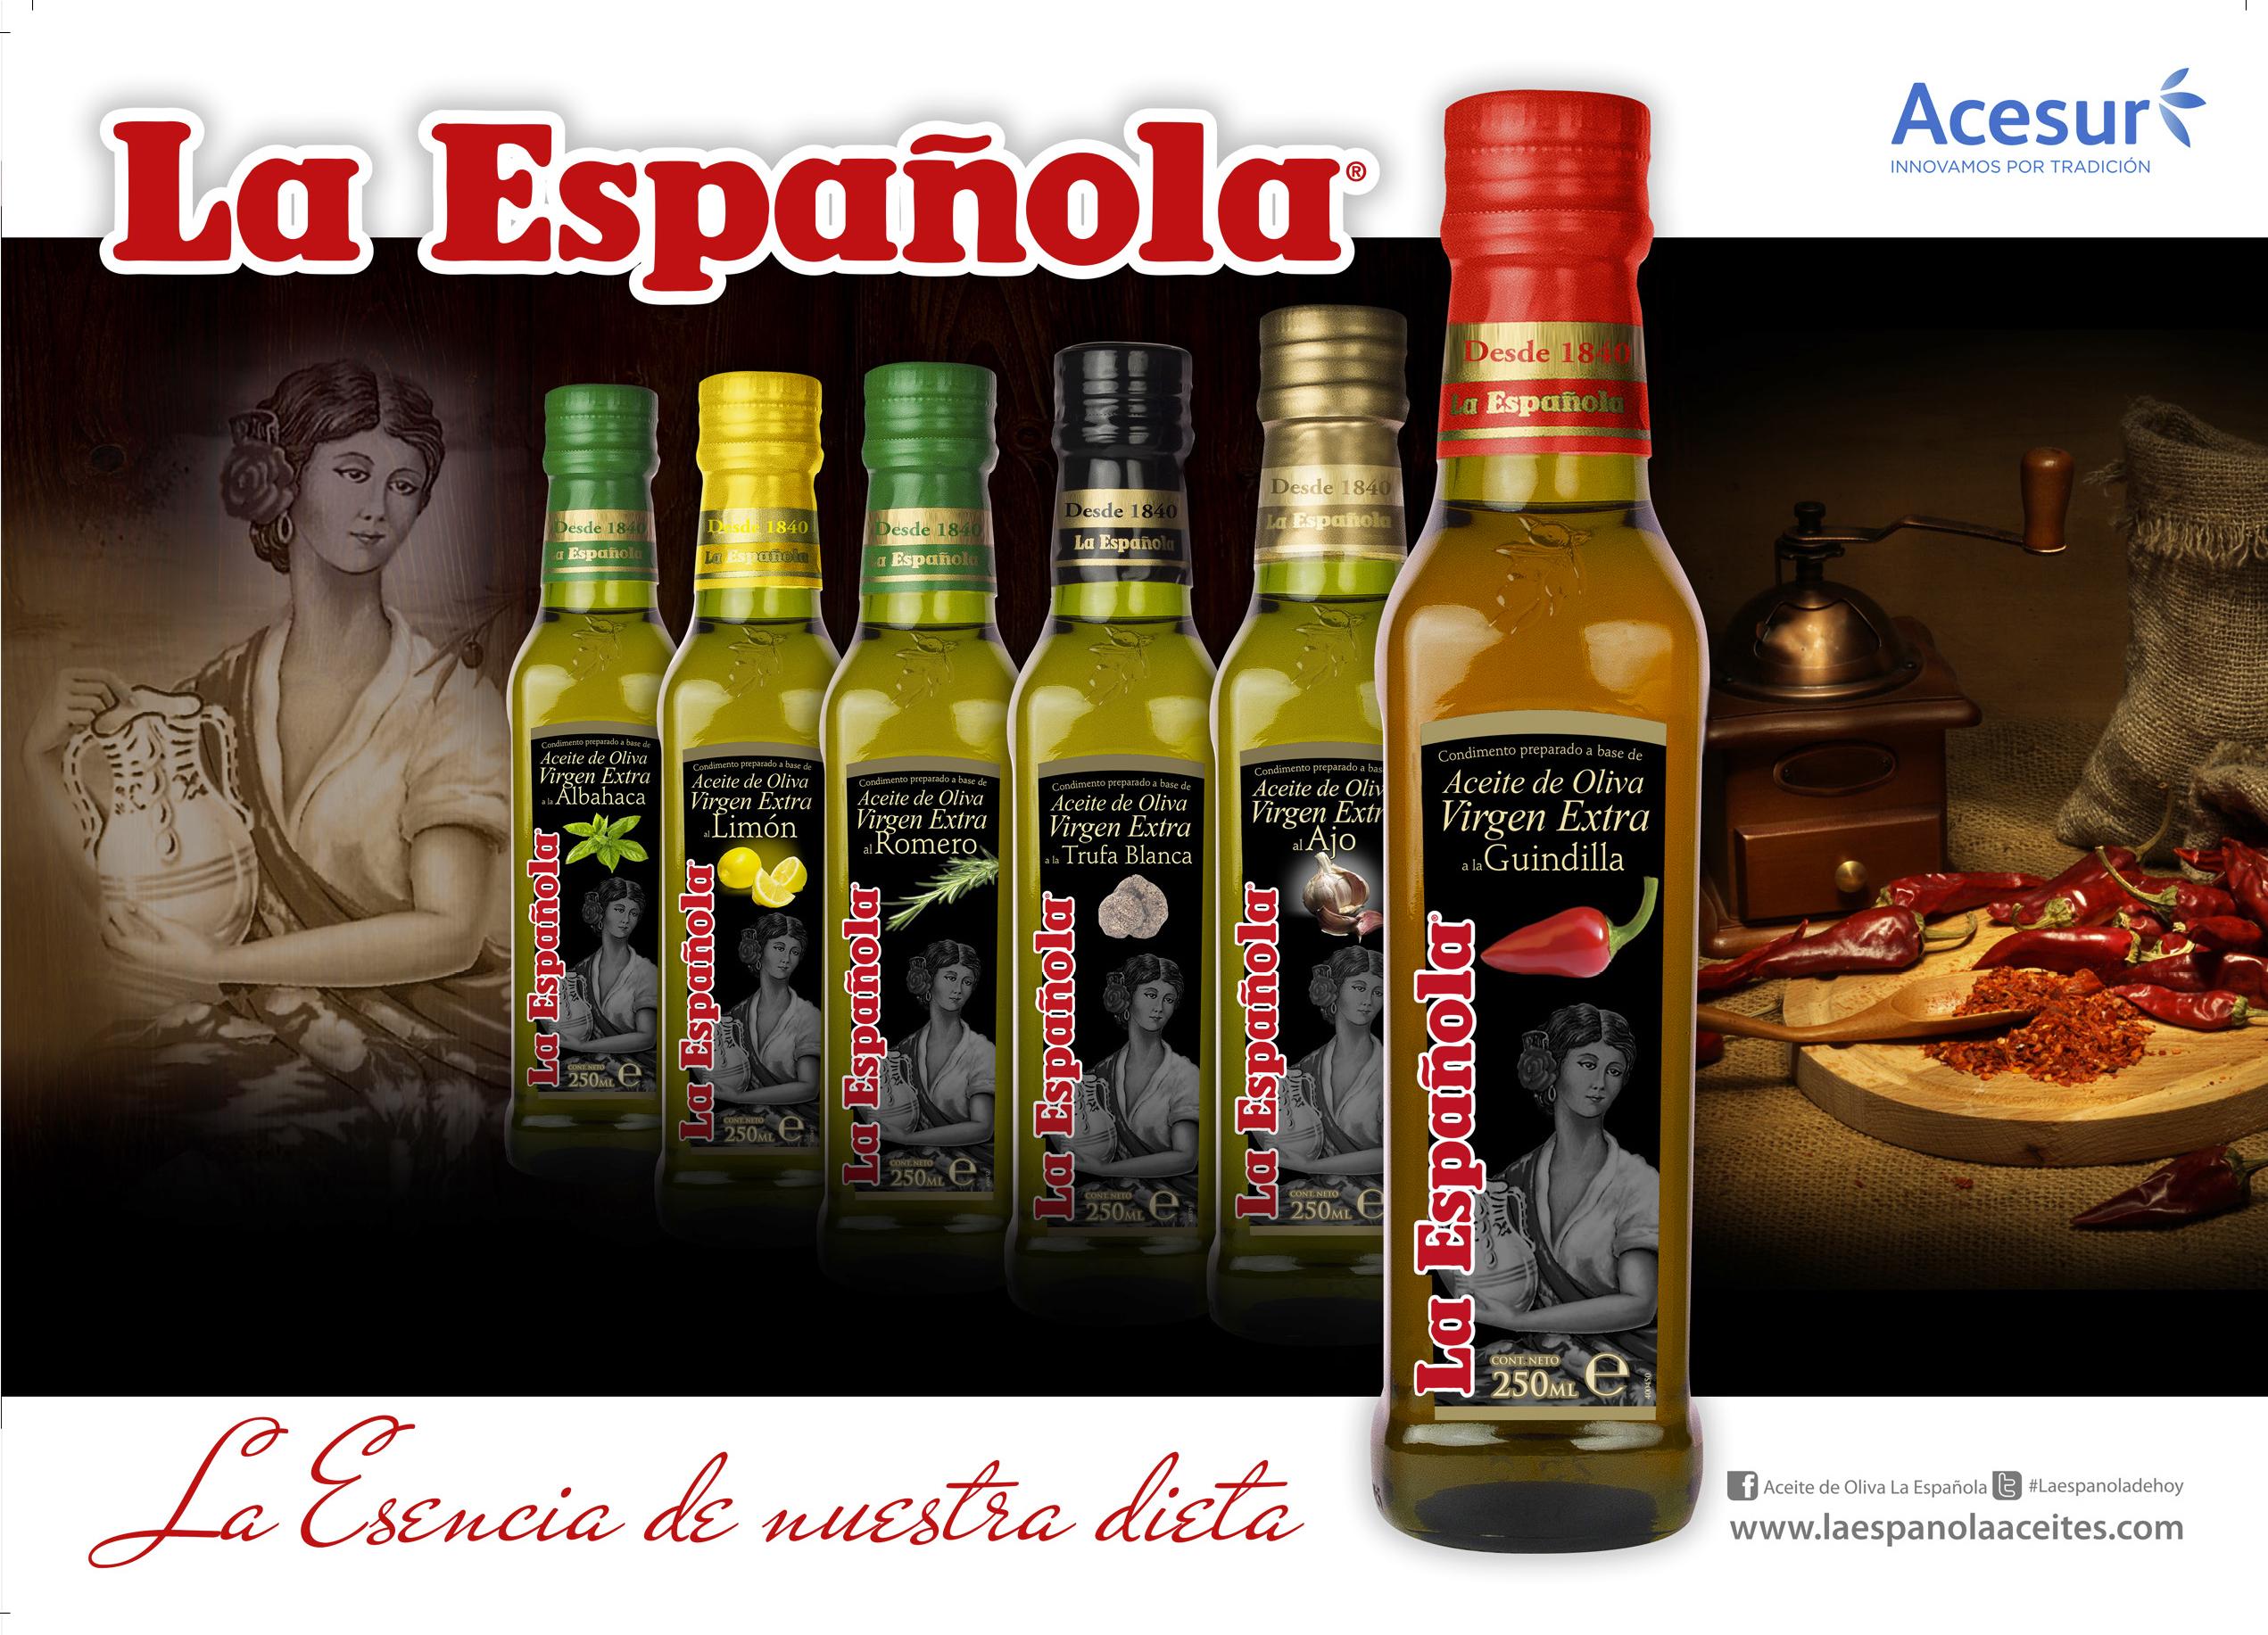 https://www.marcasrenombradas.com/wp-content/uploads/2014/07/laespanola-3.jpg